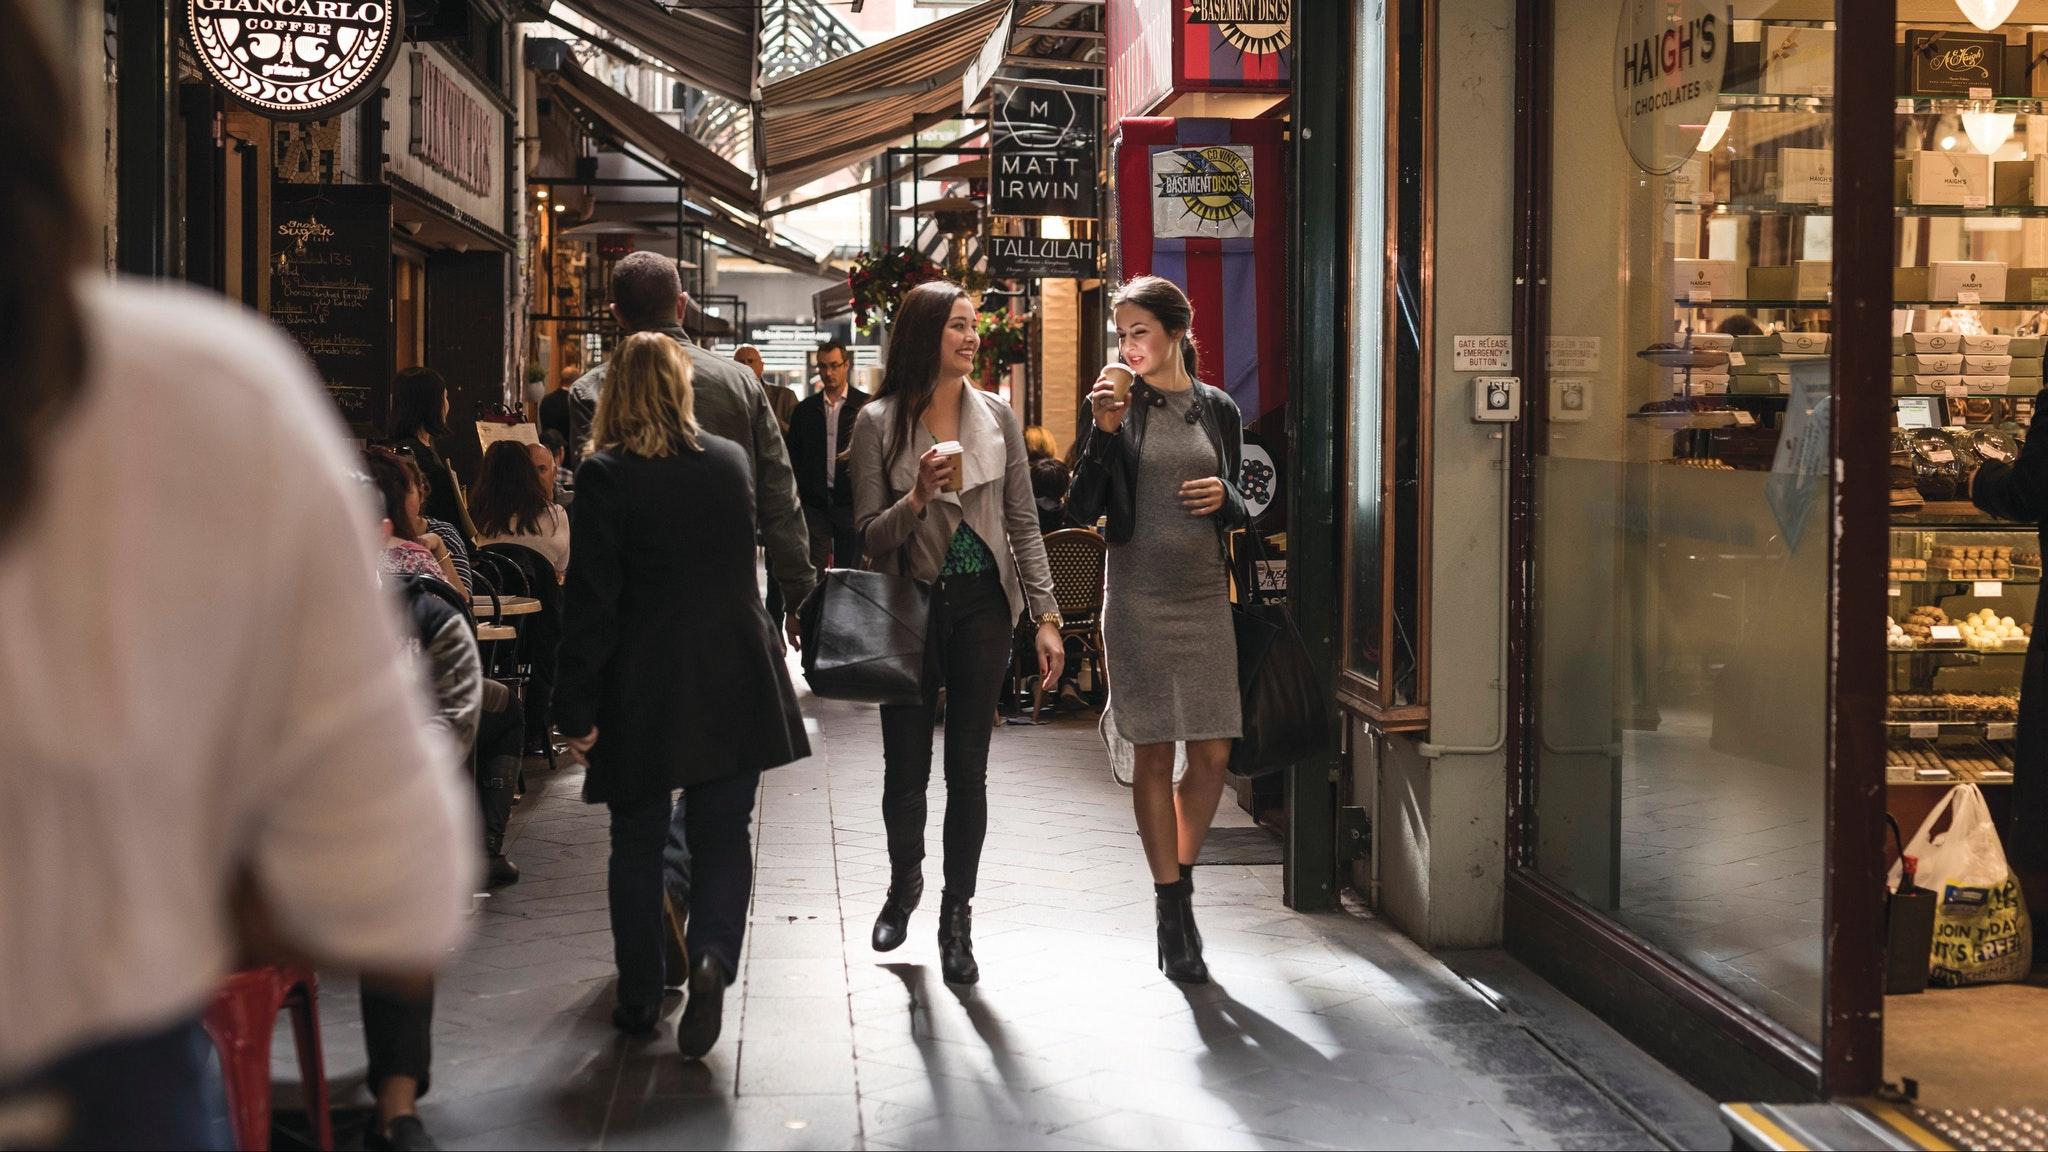 Melbourne Laneways and Arcades